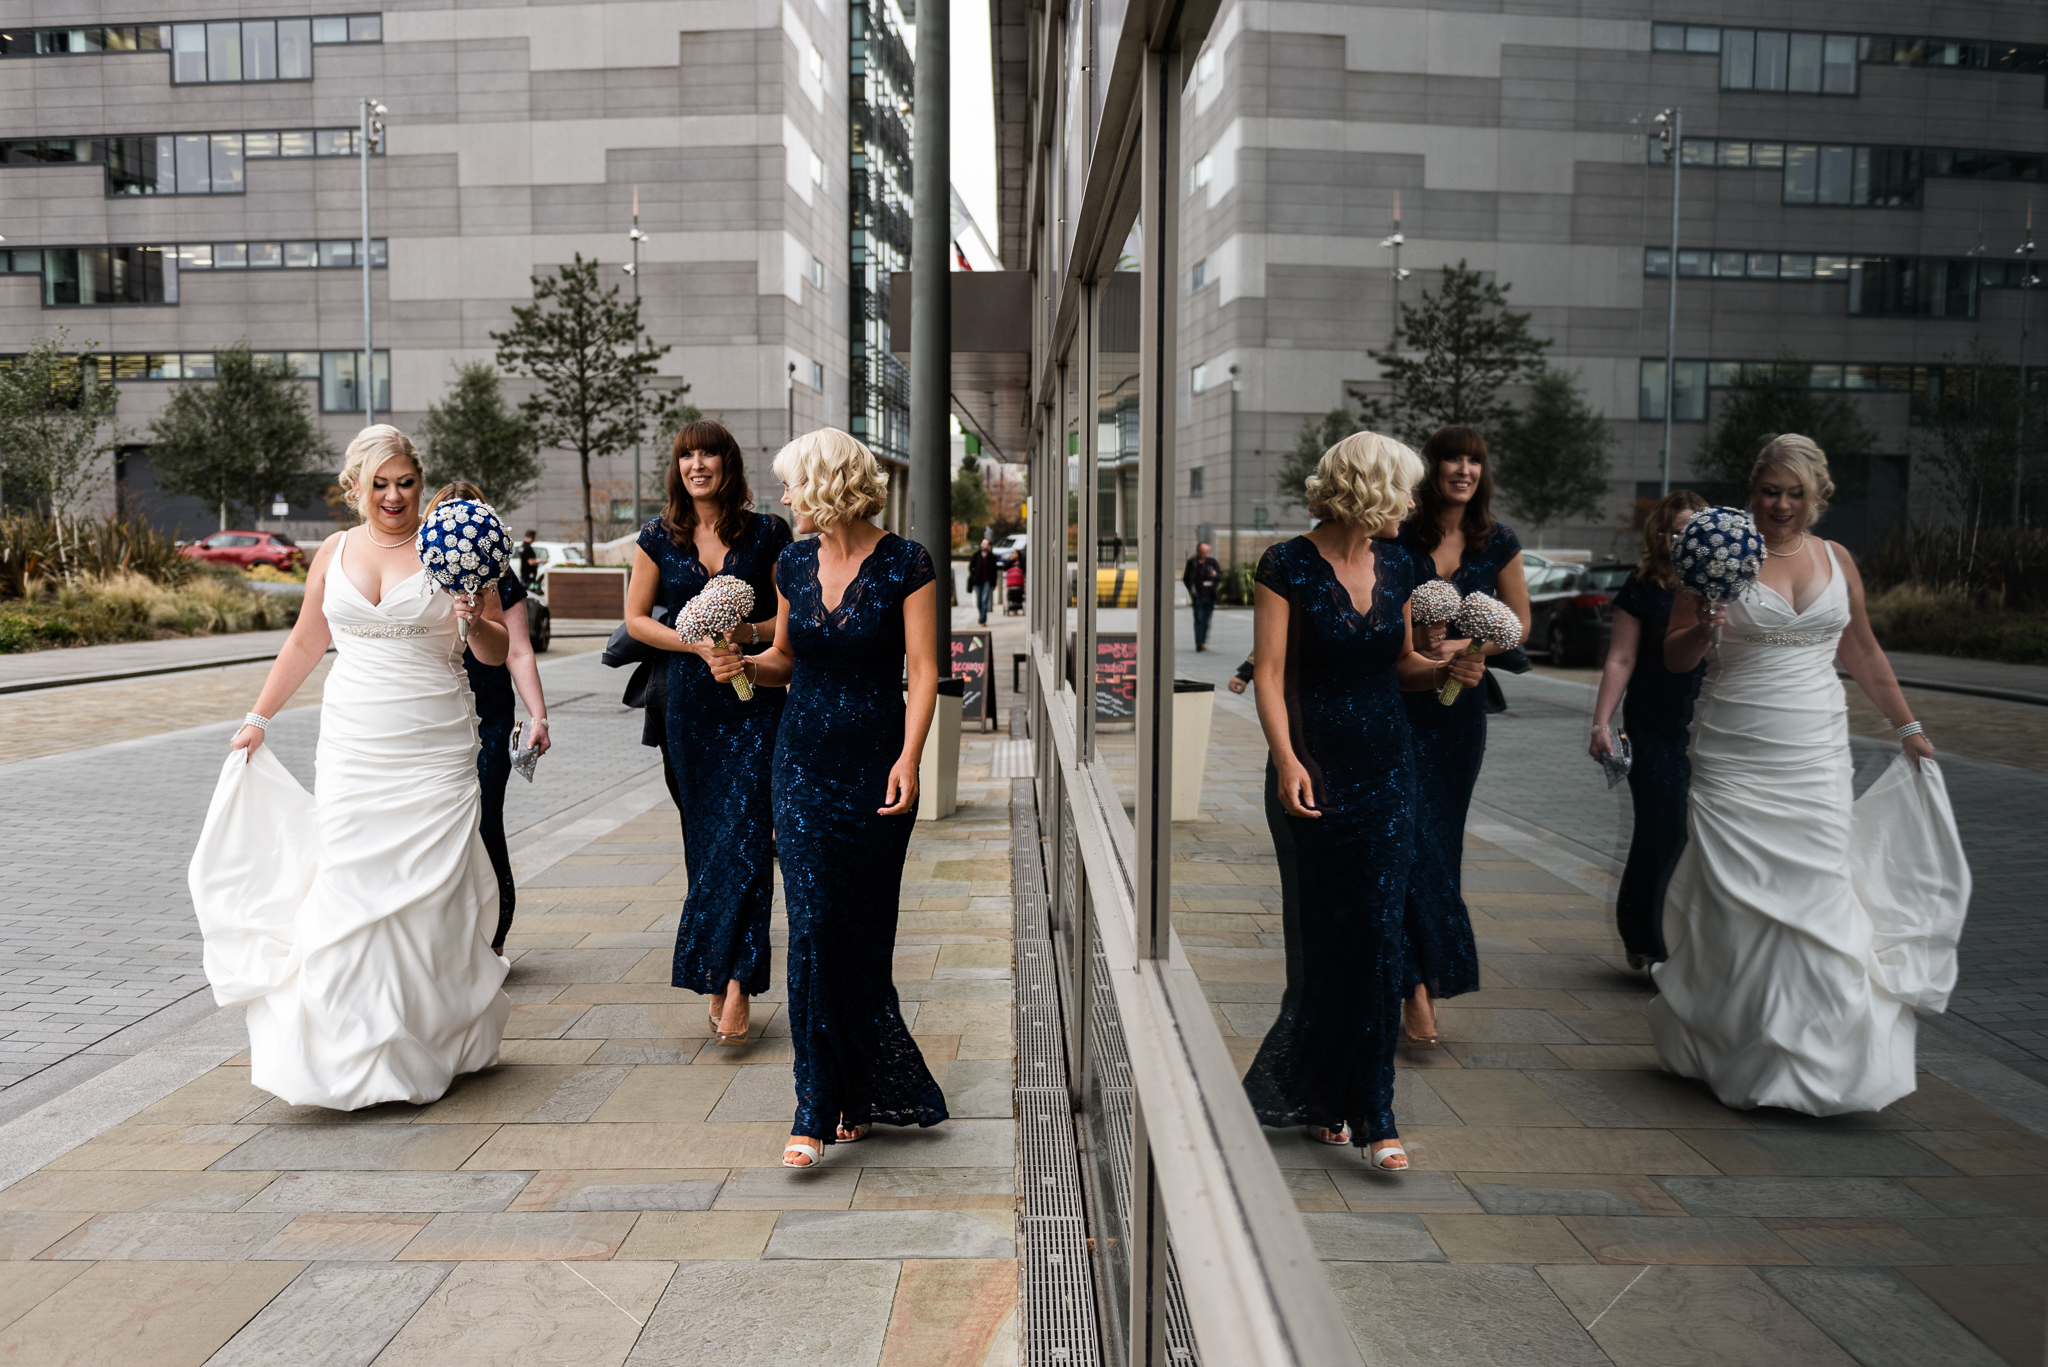 Manchester Wedding Photography On the 7th Media City UK, Salford 20s Art Deco Feathers Urban - Jenny Harper-14.jpg